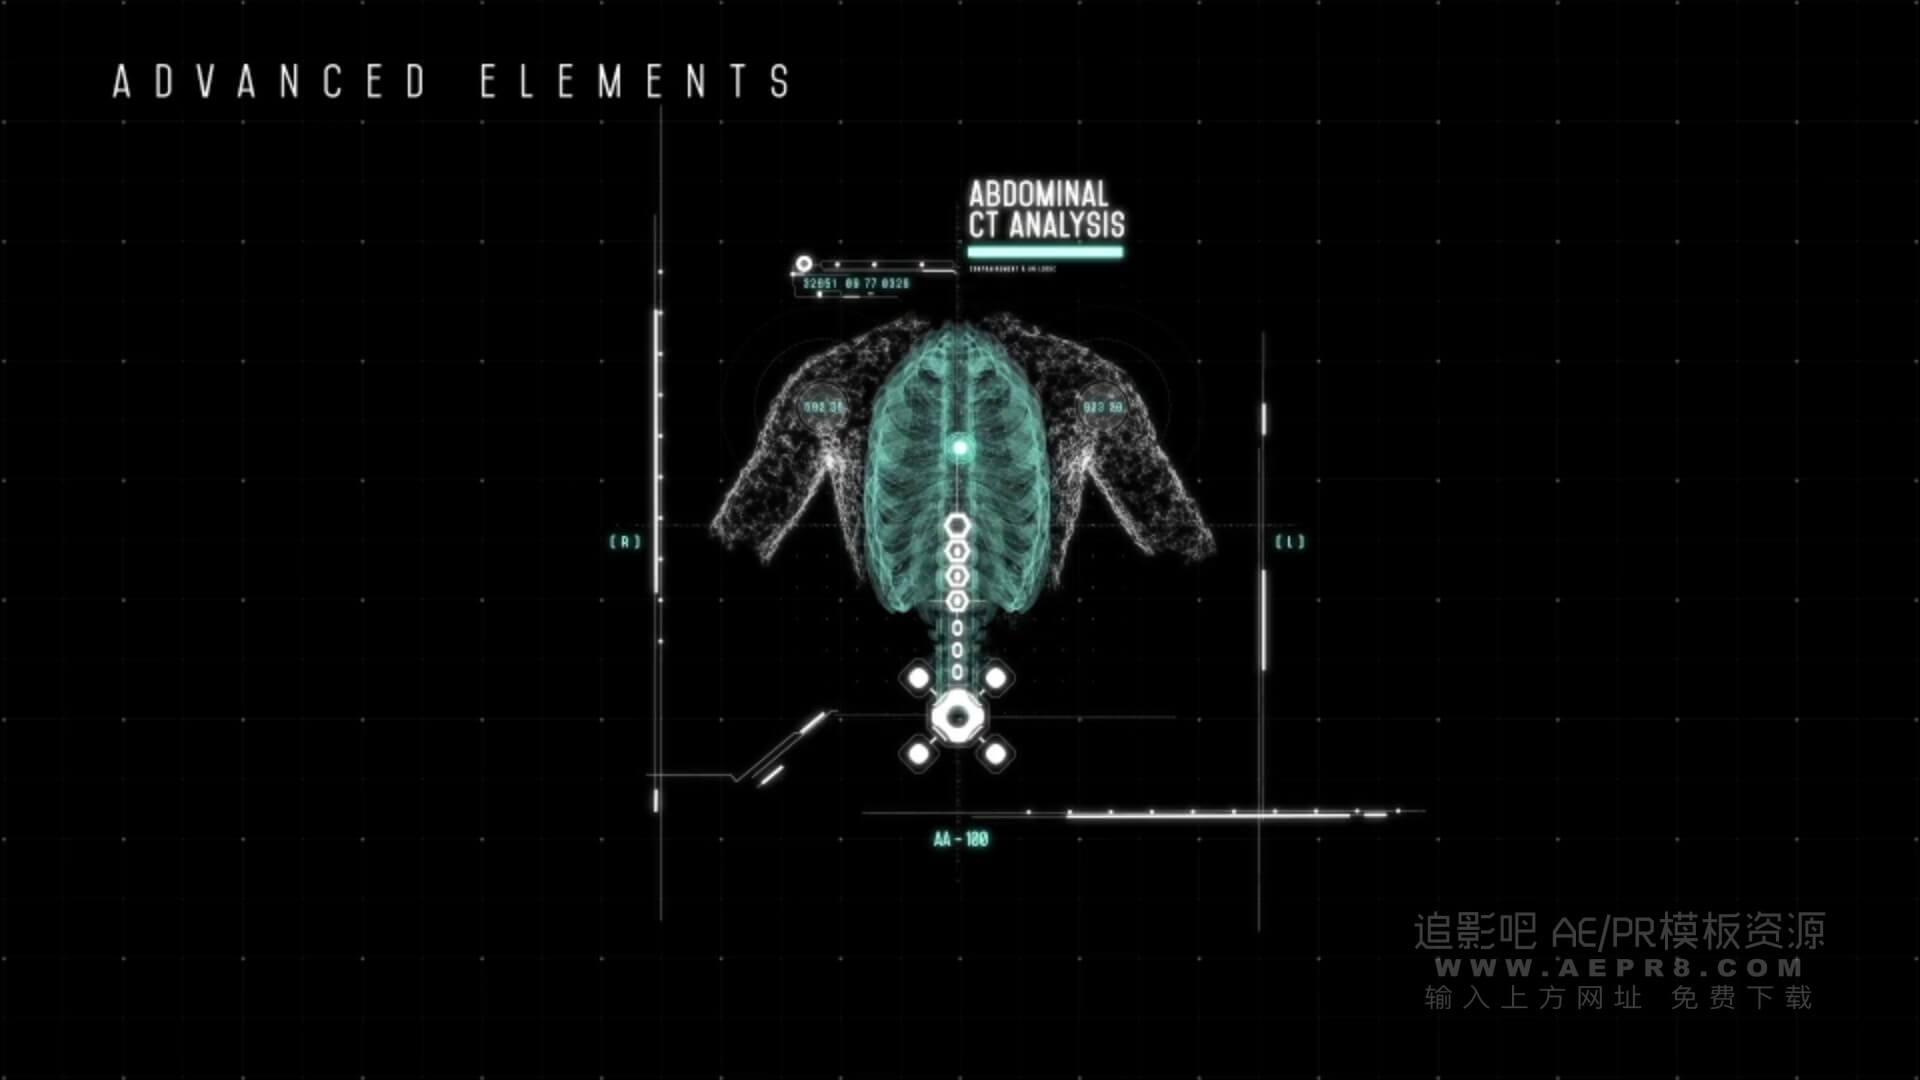 Ae模板 265个HUD元素科技医疗信息图形交互界面 hud titan interface